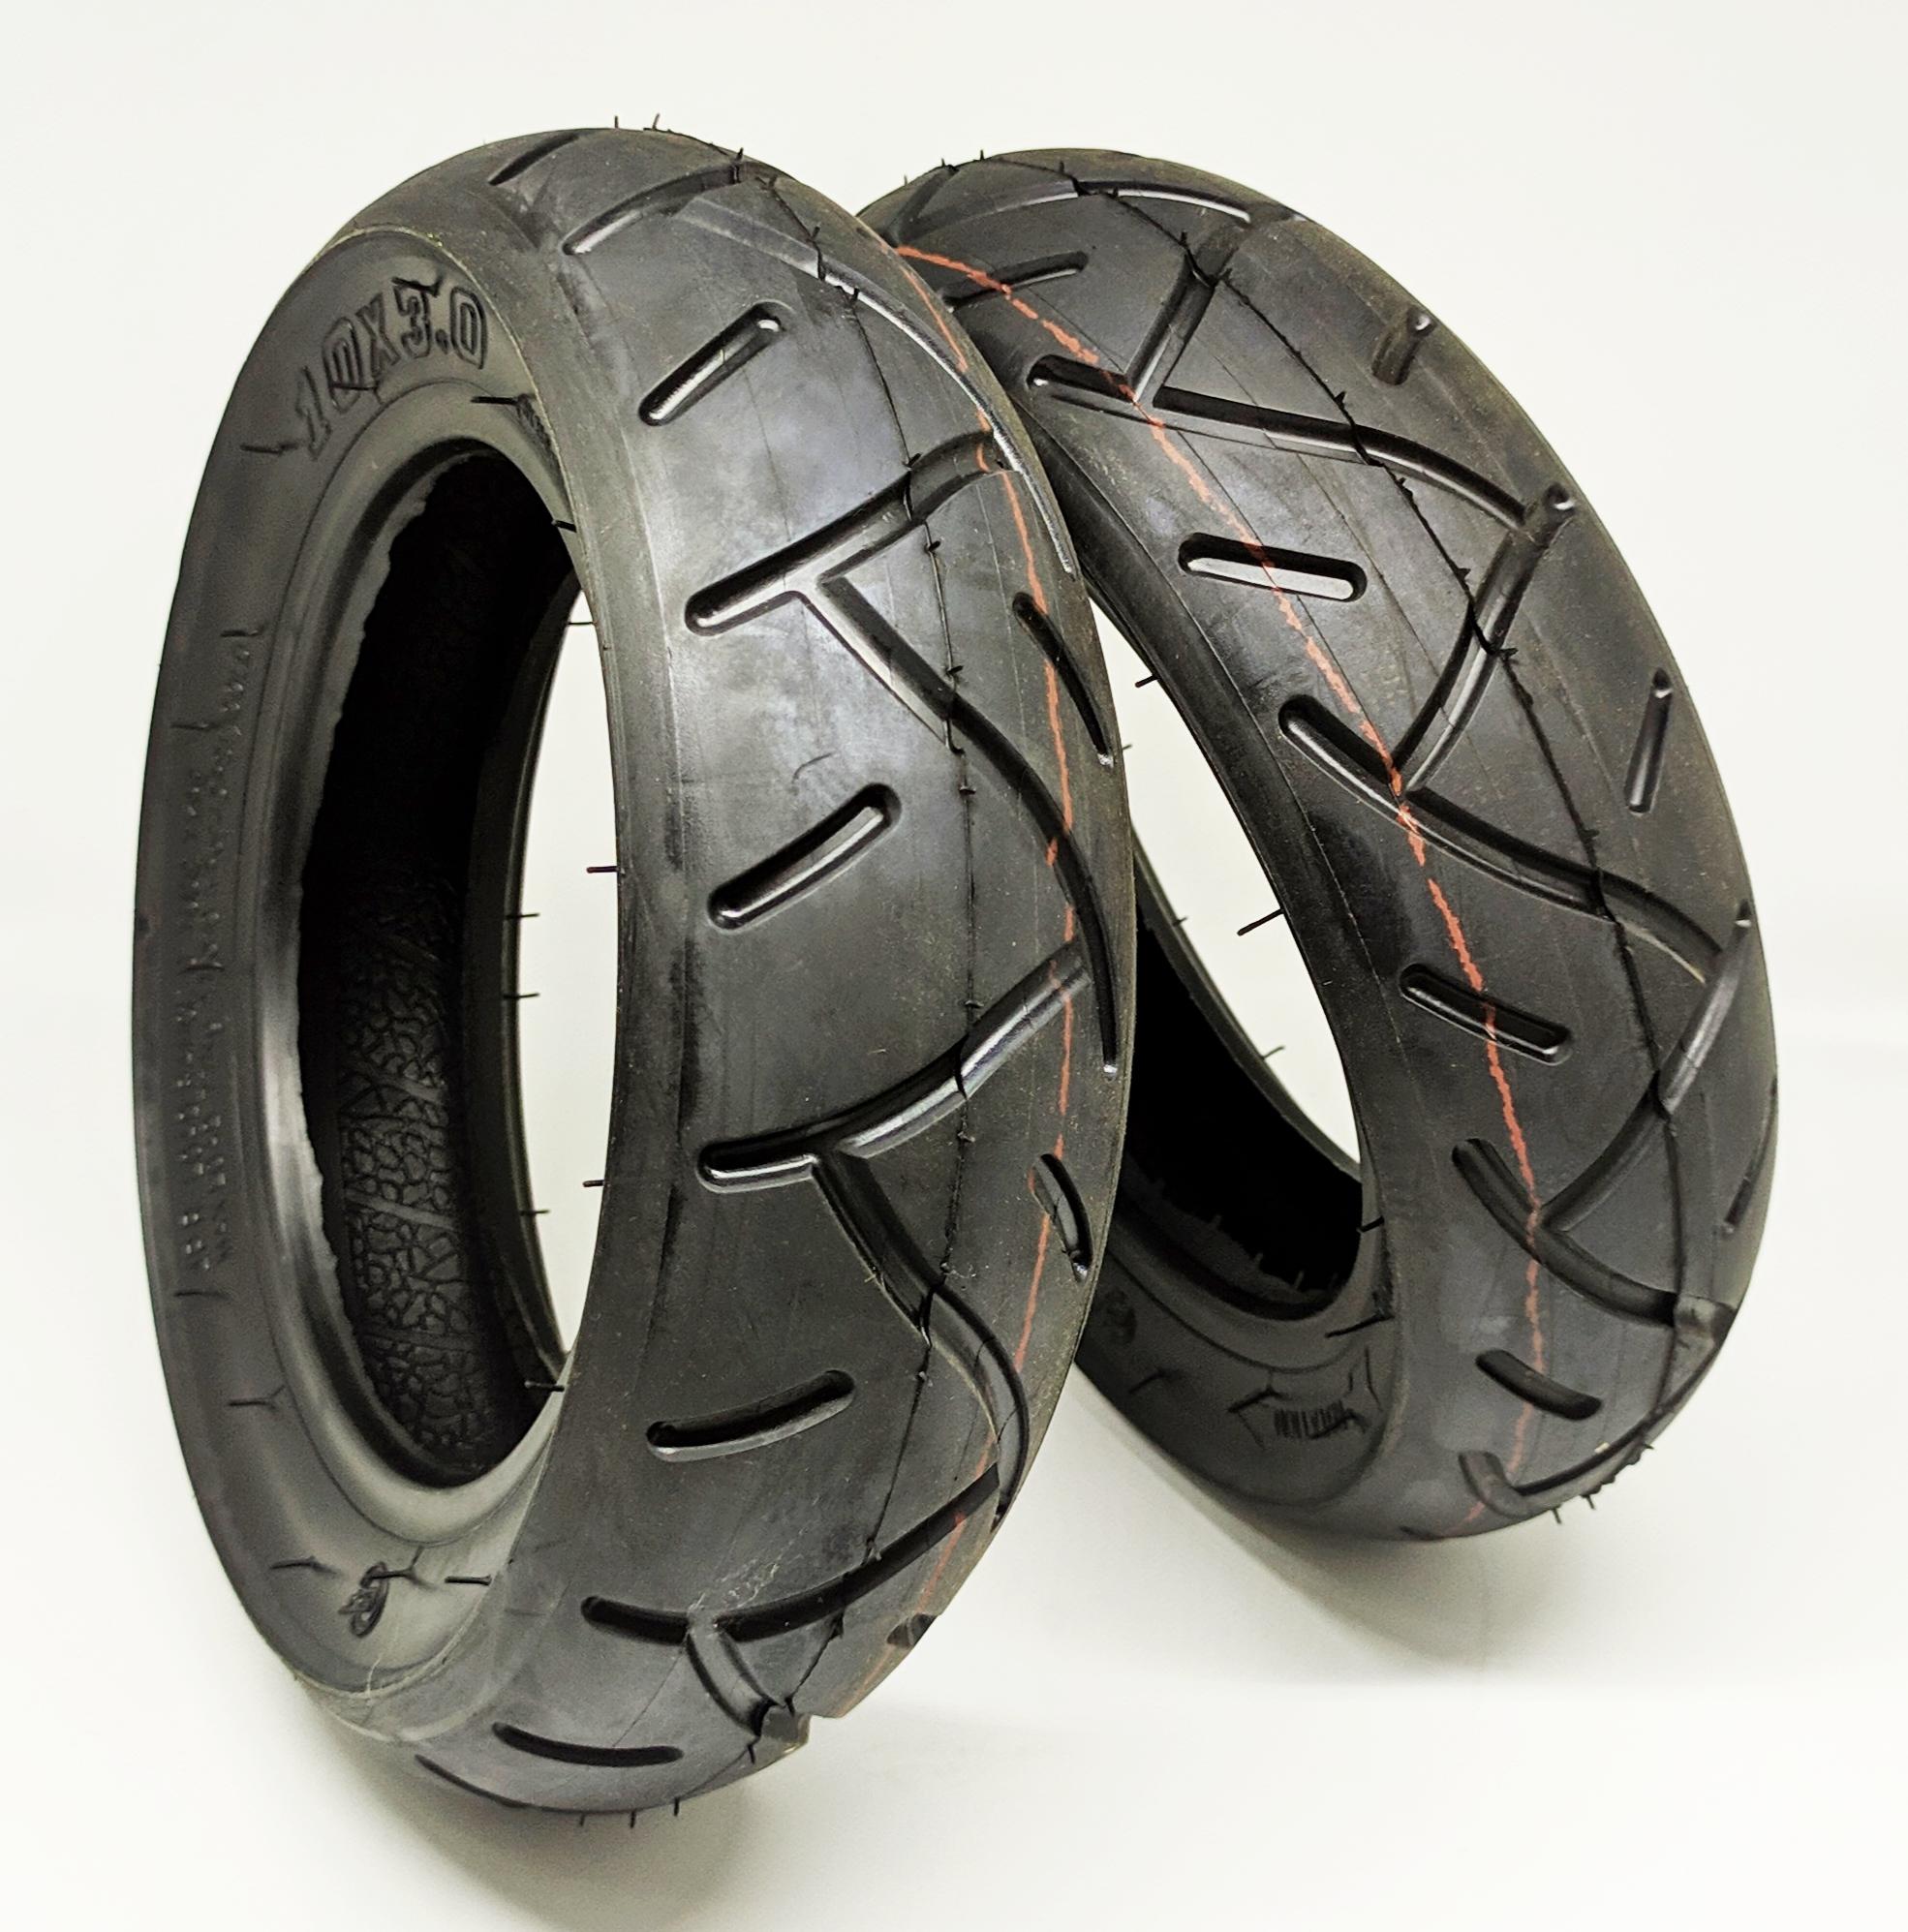 IMG 20200519 153325 - 10 x 3 inch GST Vacuum Tire